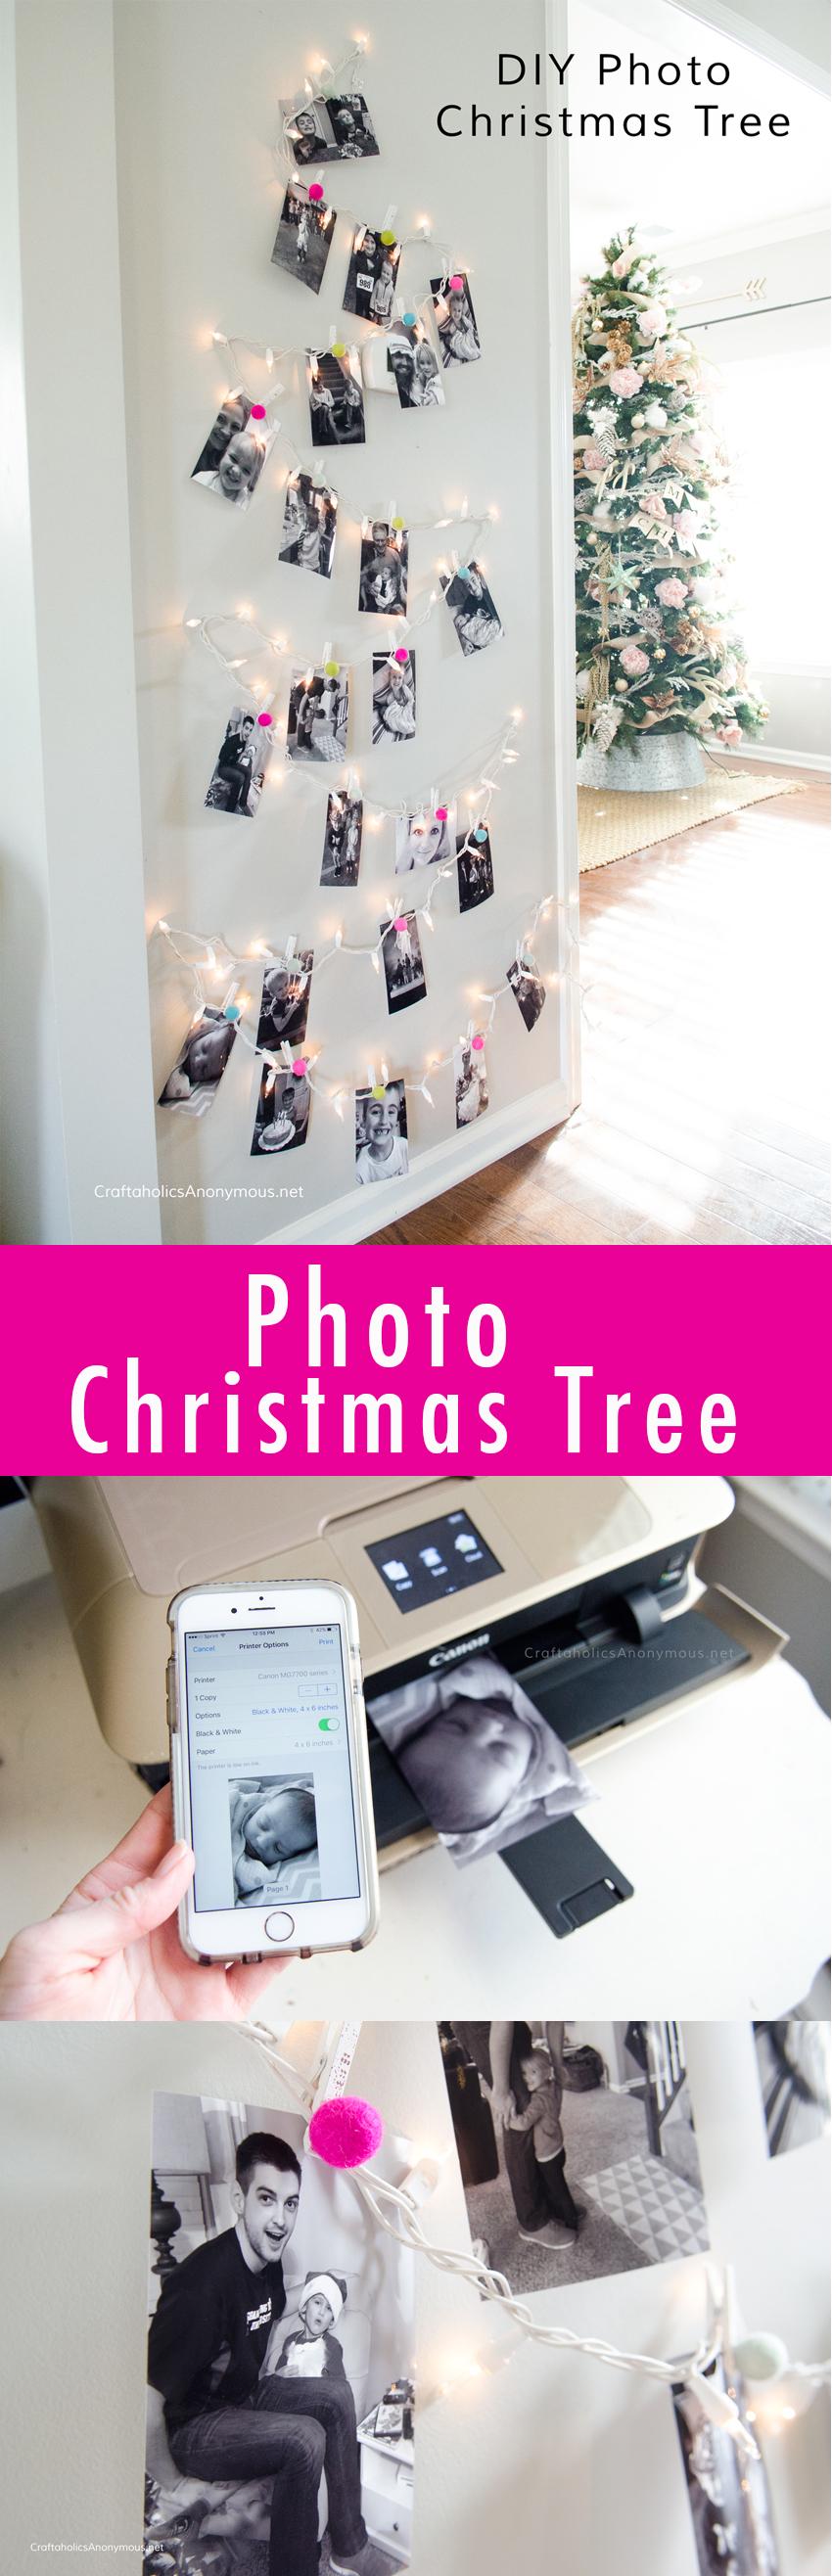 Photo Christmas Tree using twinkle lights and felt balls